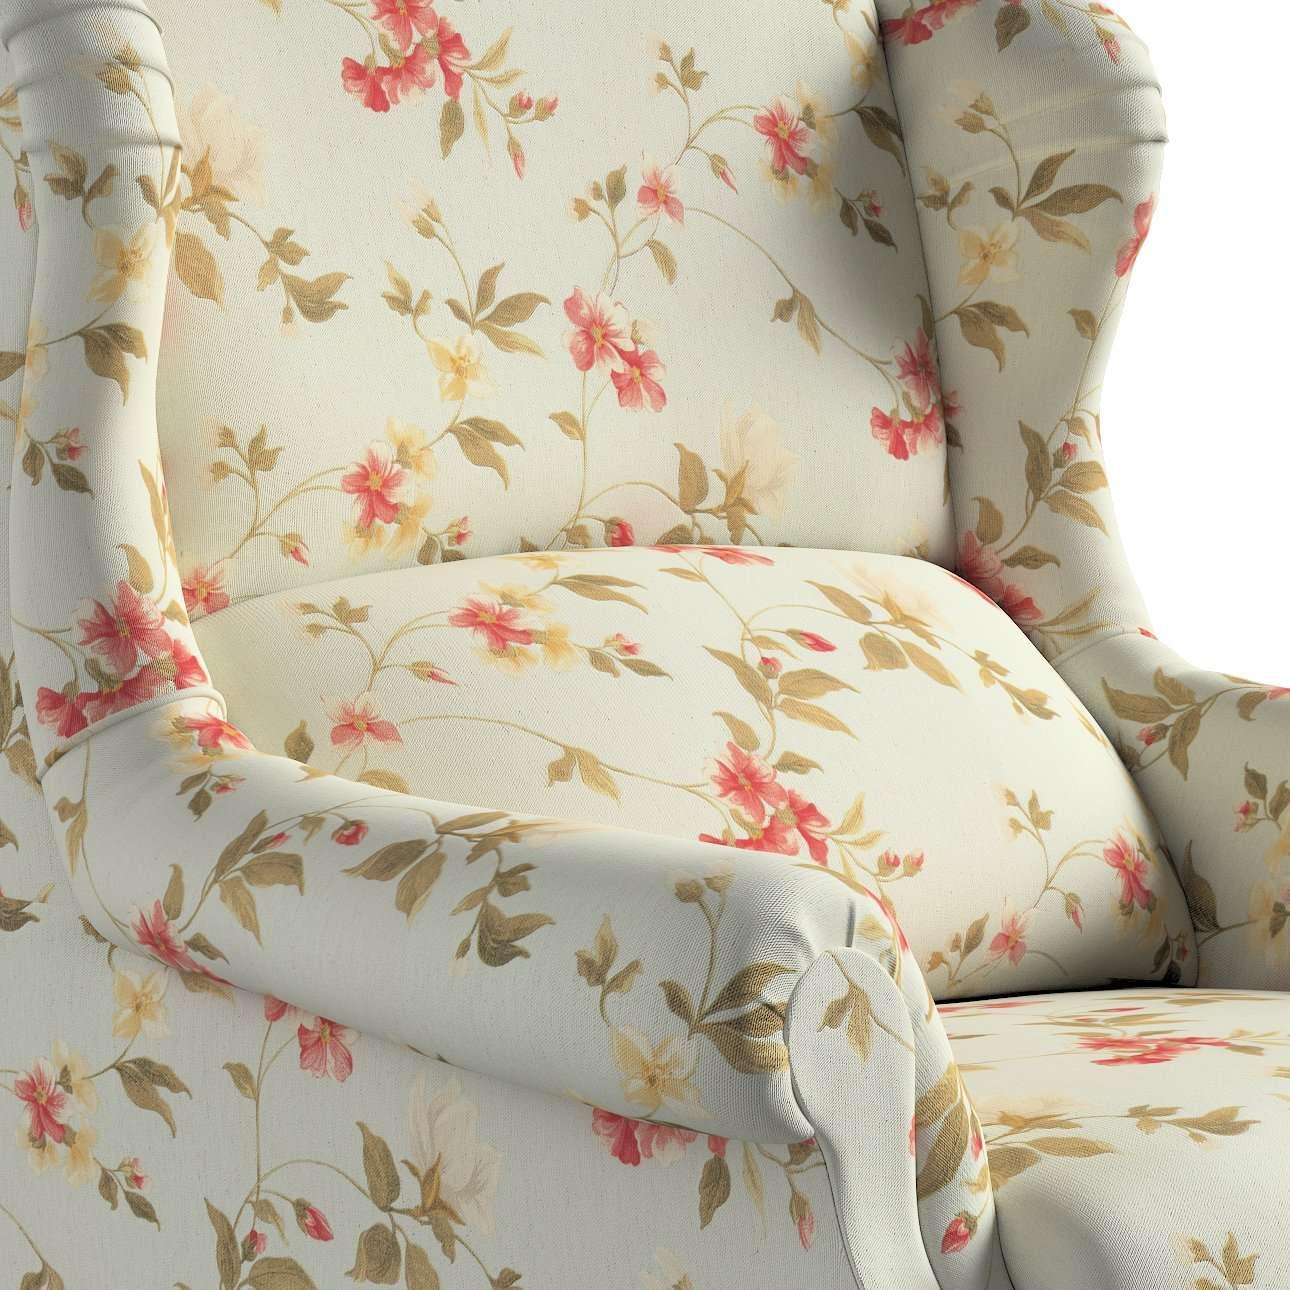 Stilingas Dekoria fotelis 63 x 115 cm kolekcijoje Londres, audinys: 124-65